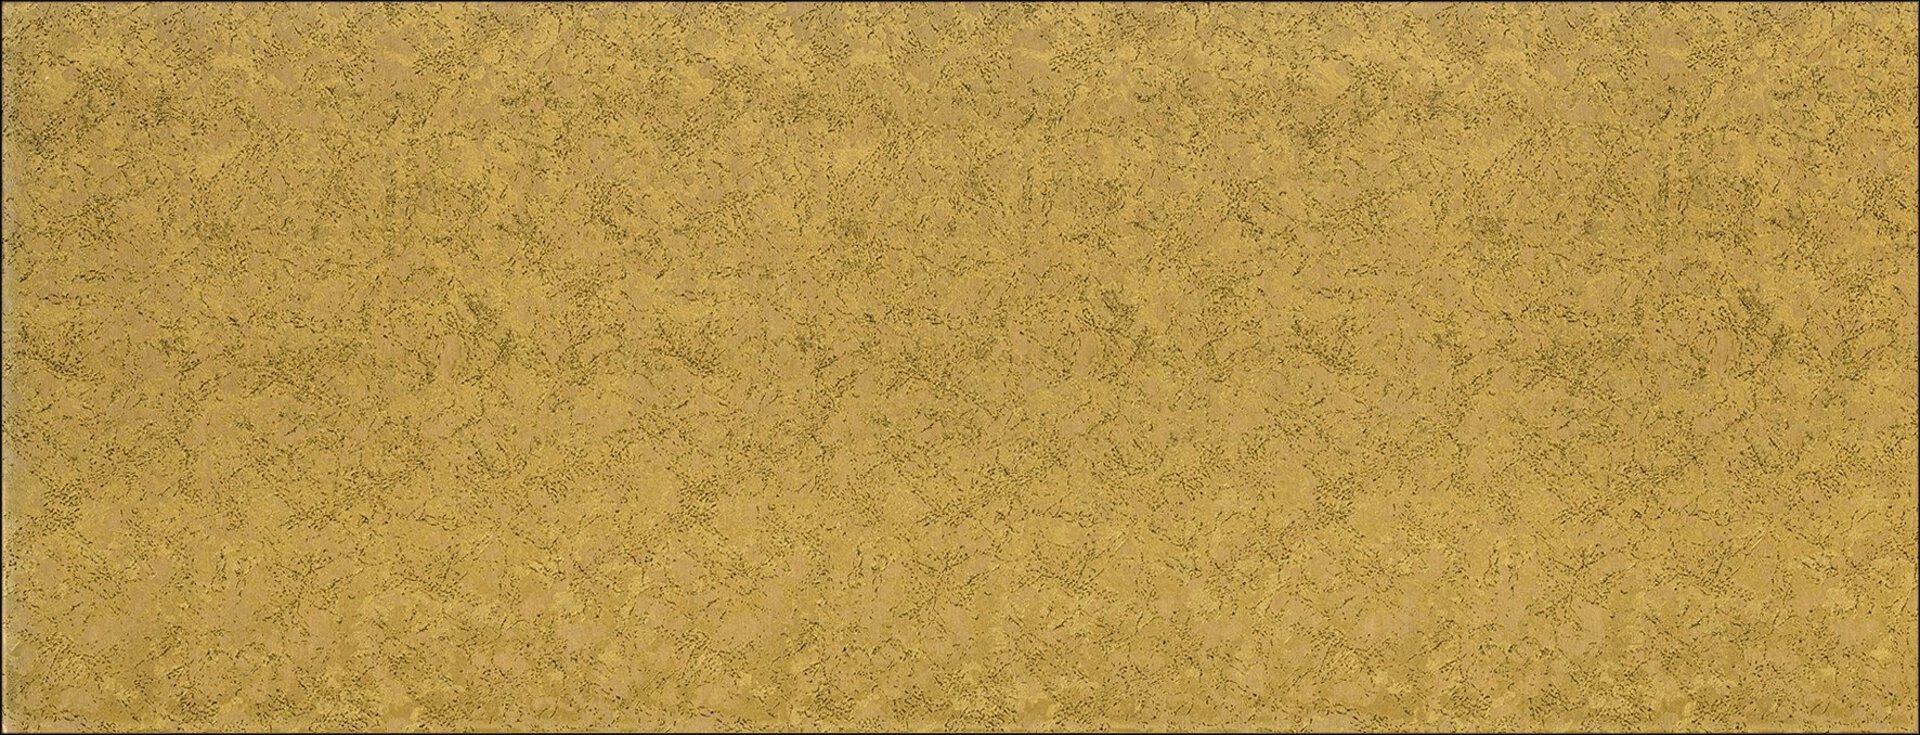 Bild Gold Pro-Art Glas mehrfarbig 80 x 30 x 1 cm